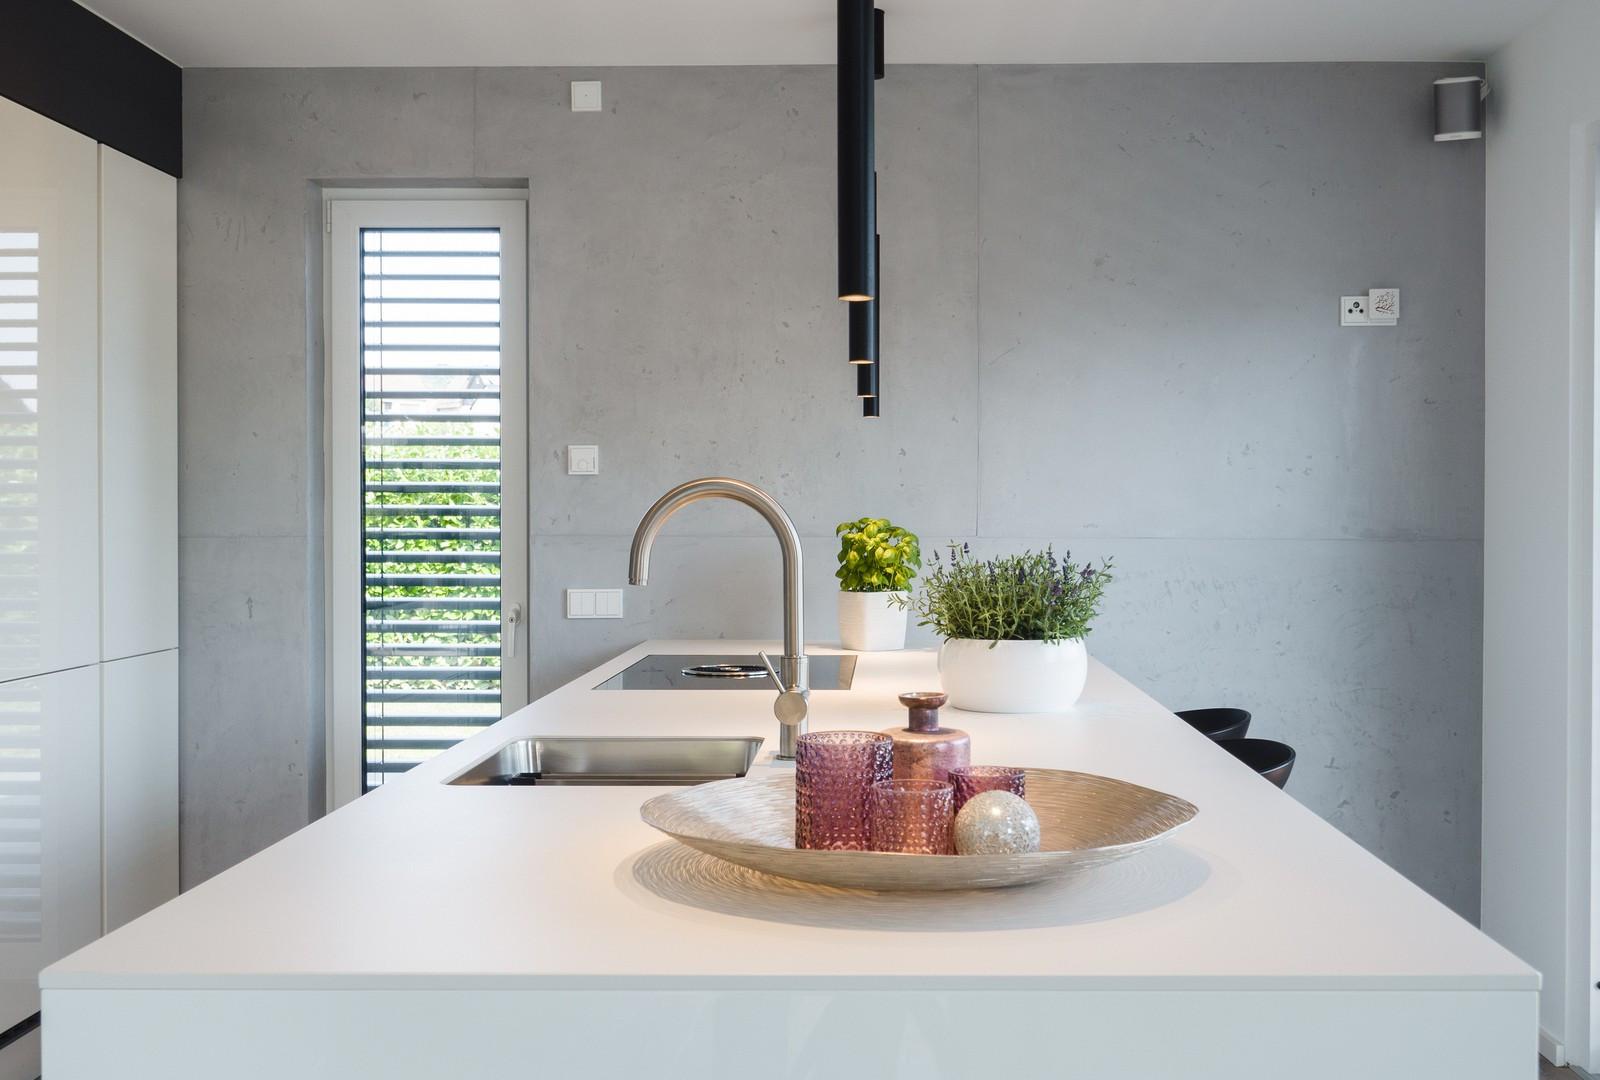 Betonwand_Wandgestaltung_Küche_ArtOfSurf